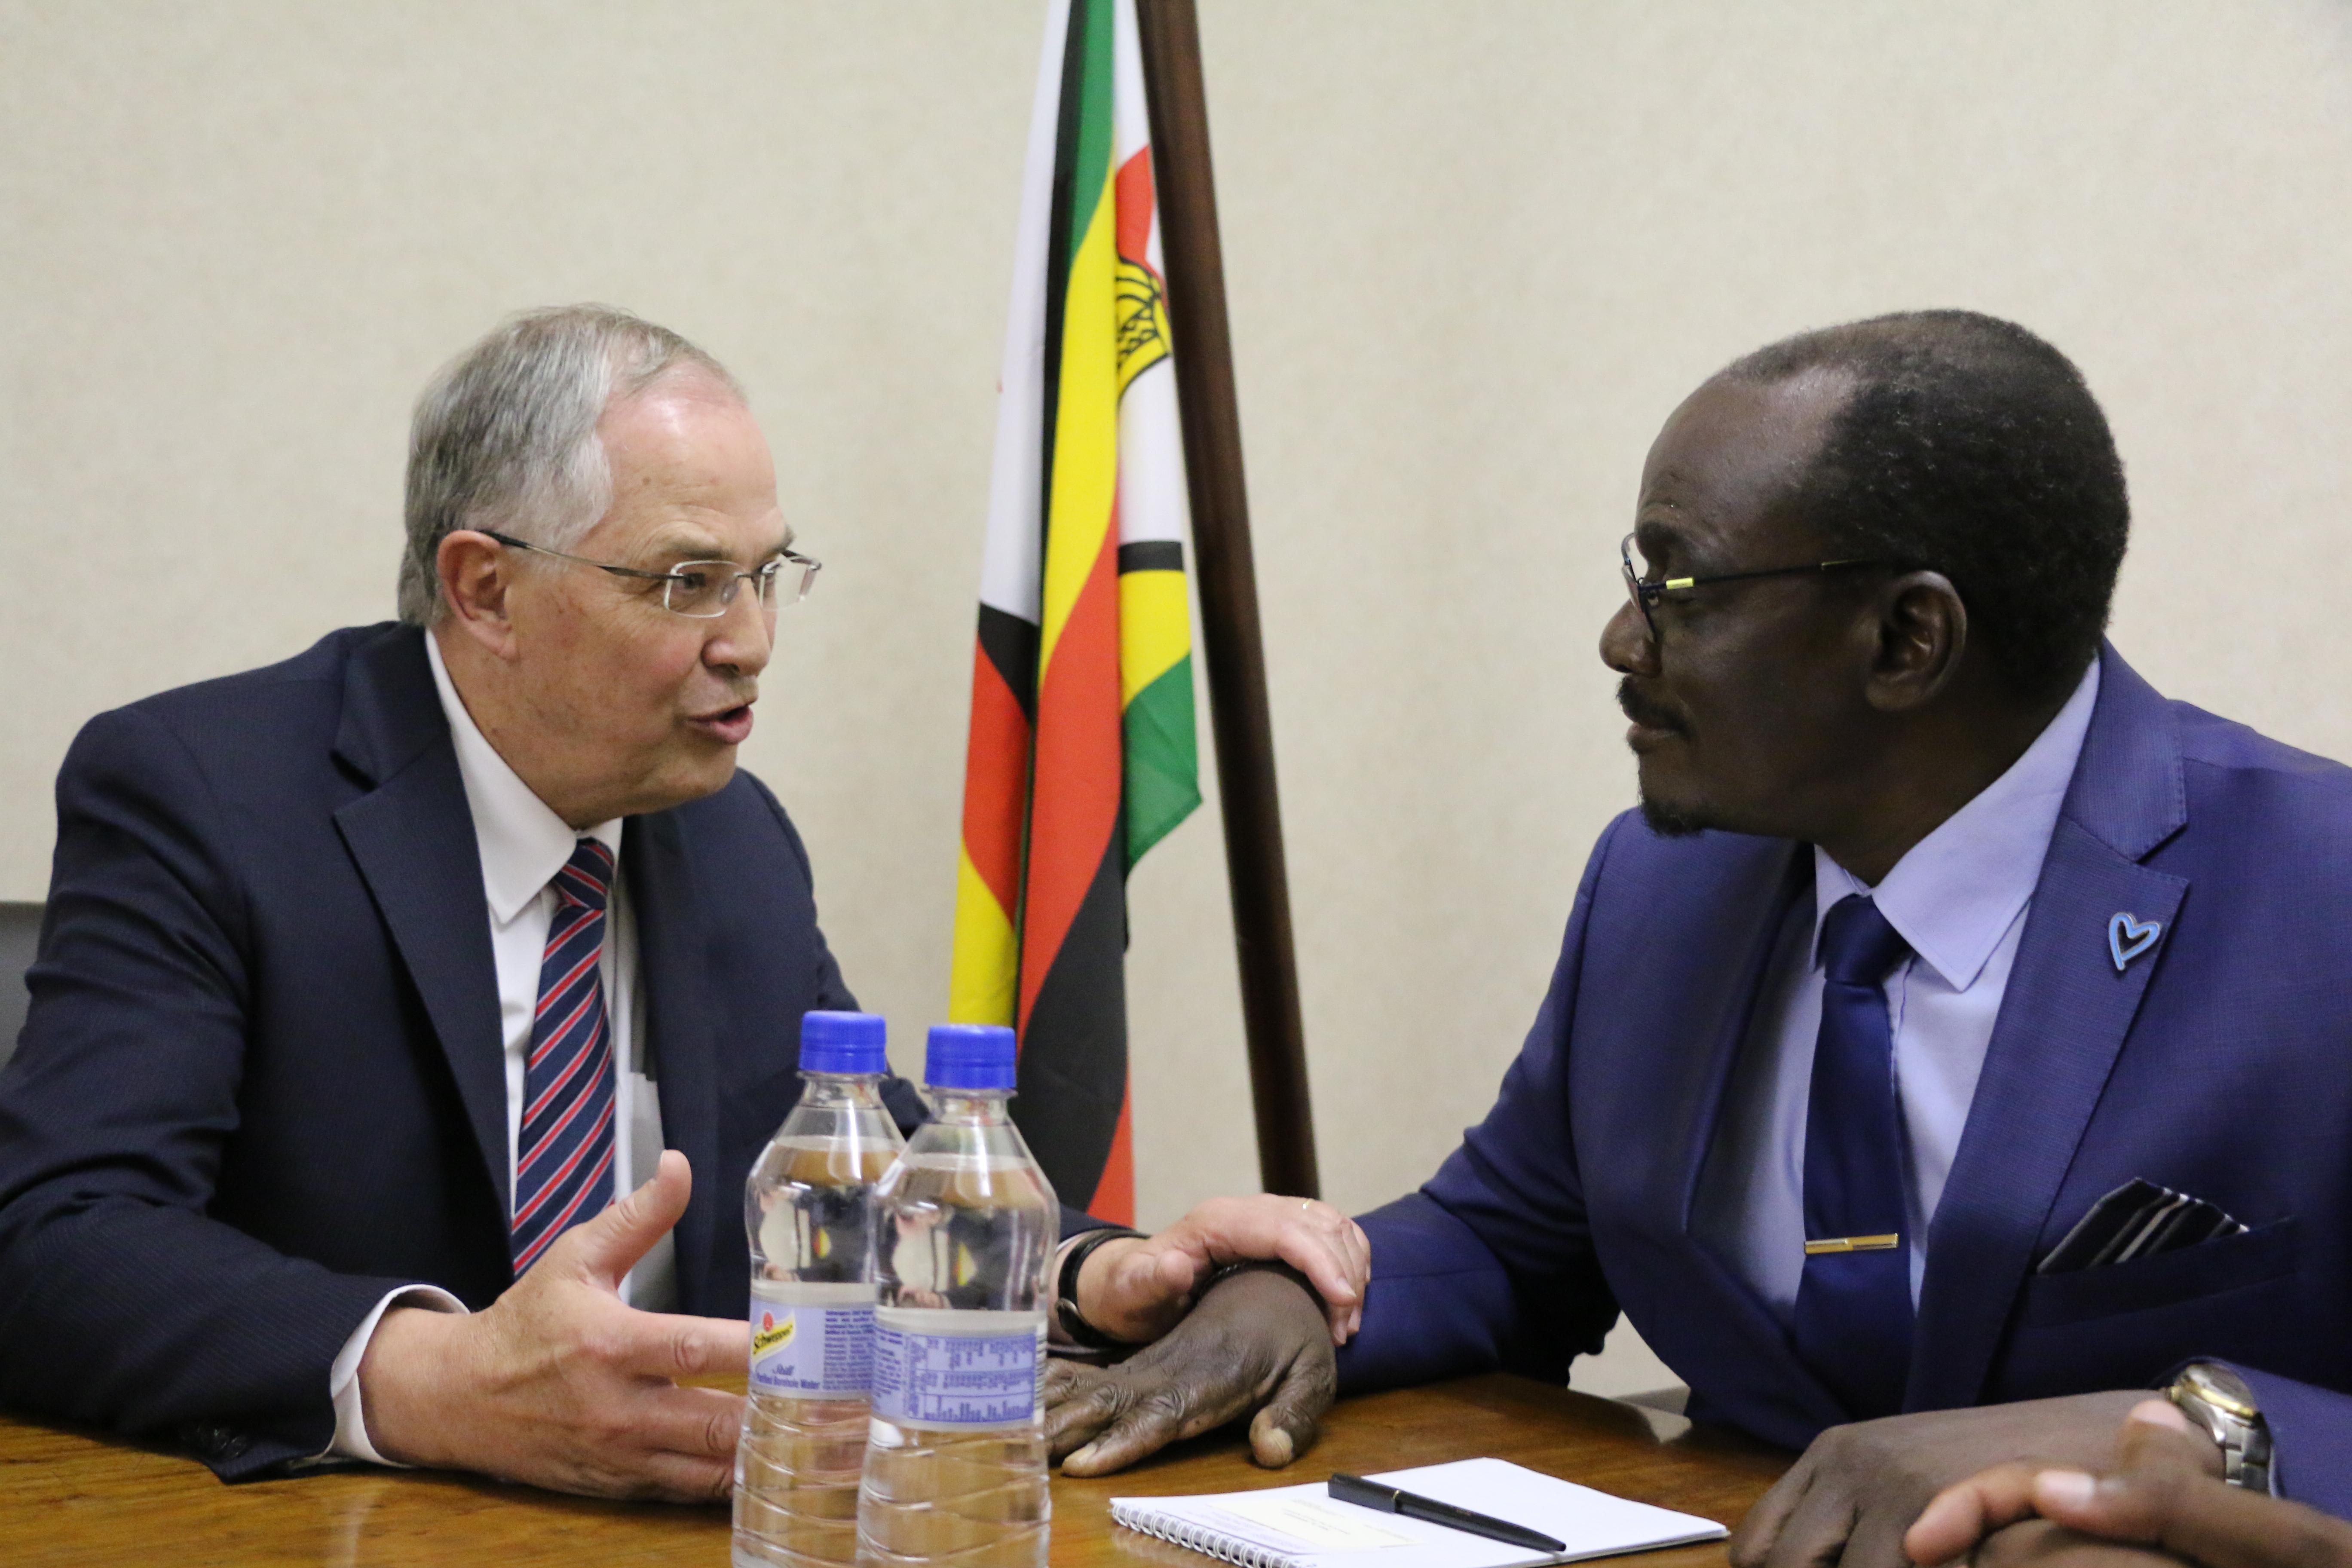 Elder Neil L. Andersen meets with Zimbabwe Vice President K. Mohadi on Nov. 15, 2018.